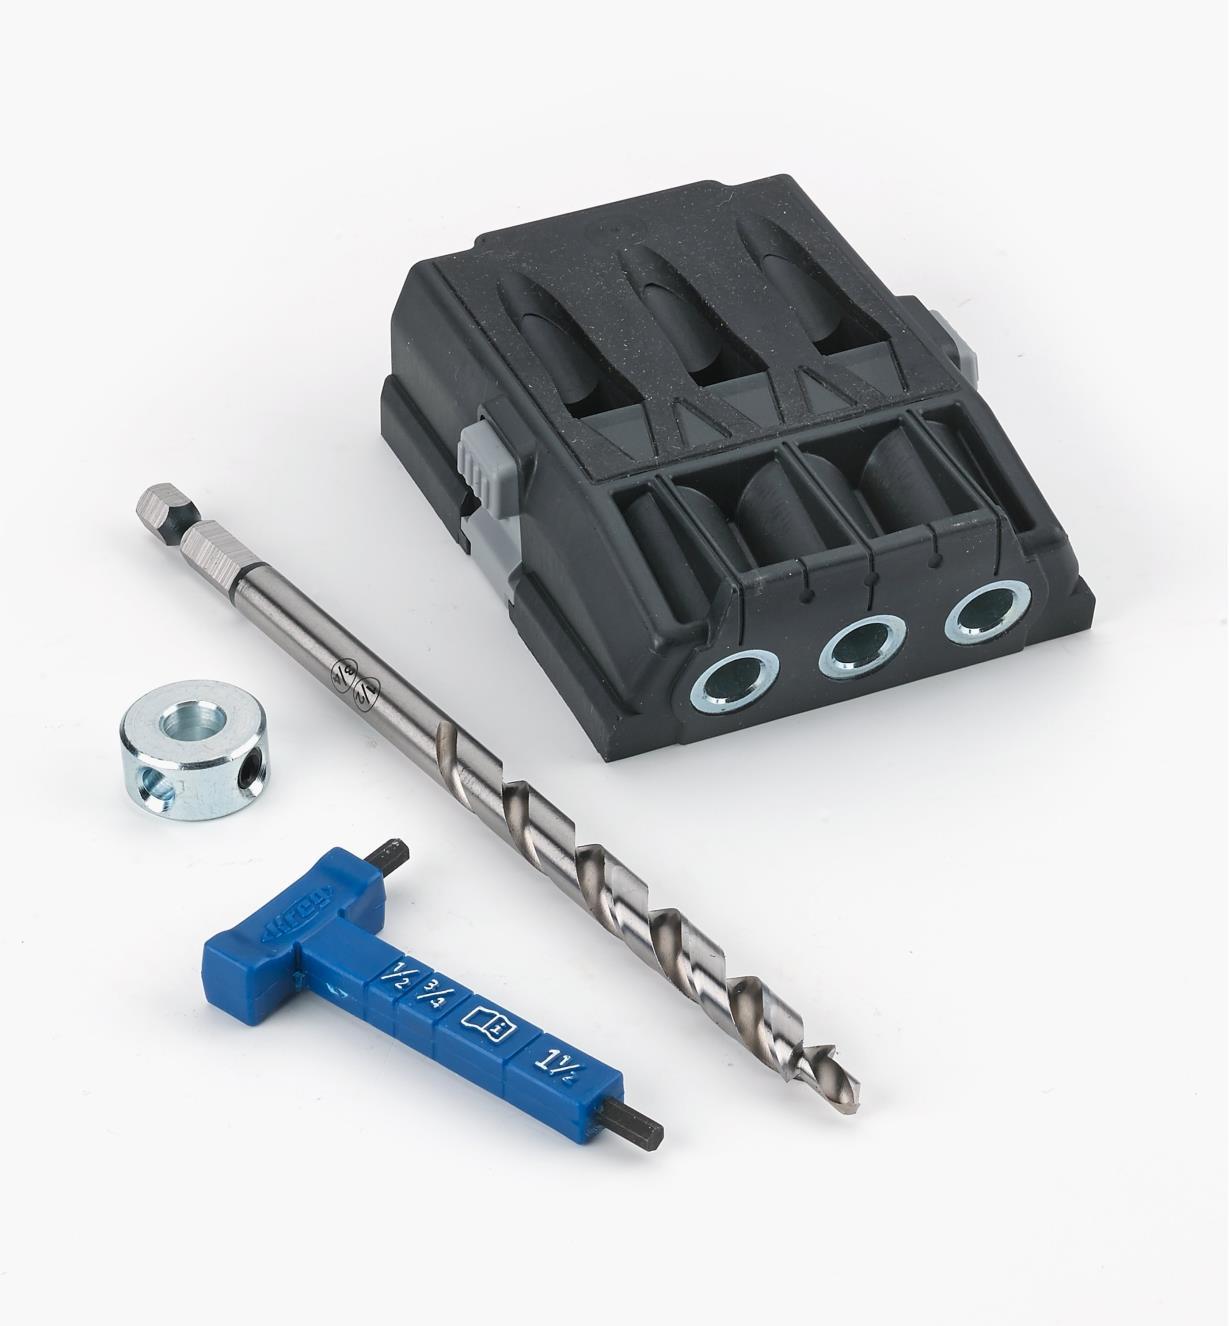 25K6196 - Kreg 530 Micro-Pocket Drill Guide